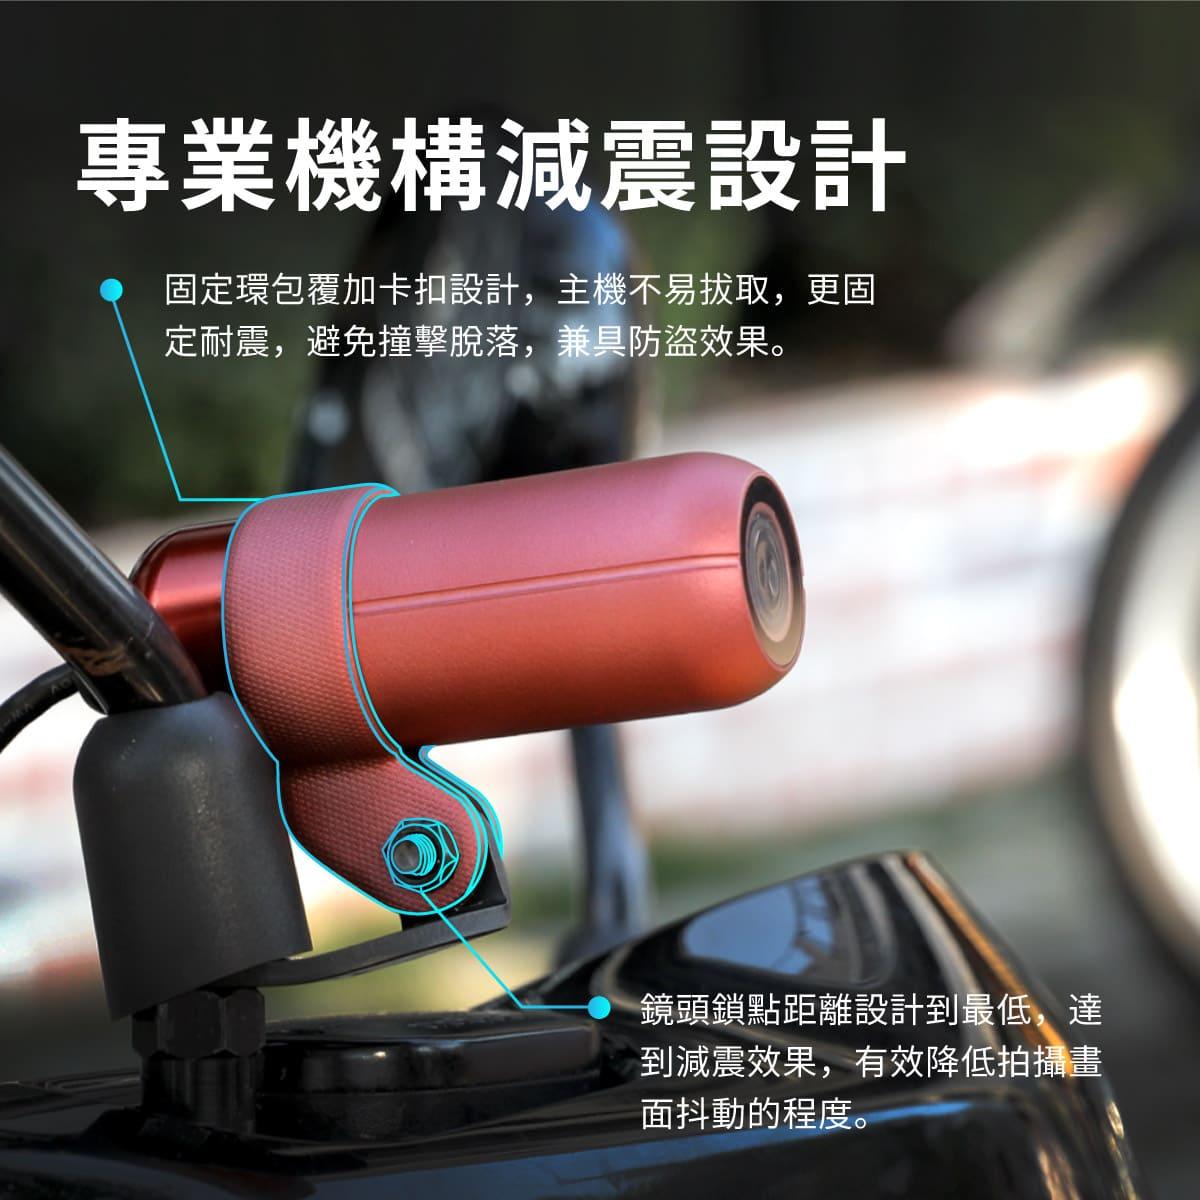 proimages/product/Bike_Cam/B53U_B63U/19.jpg